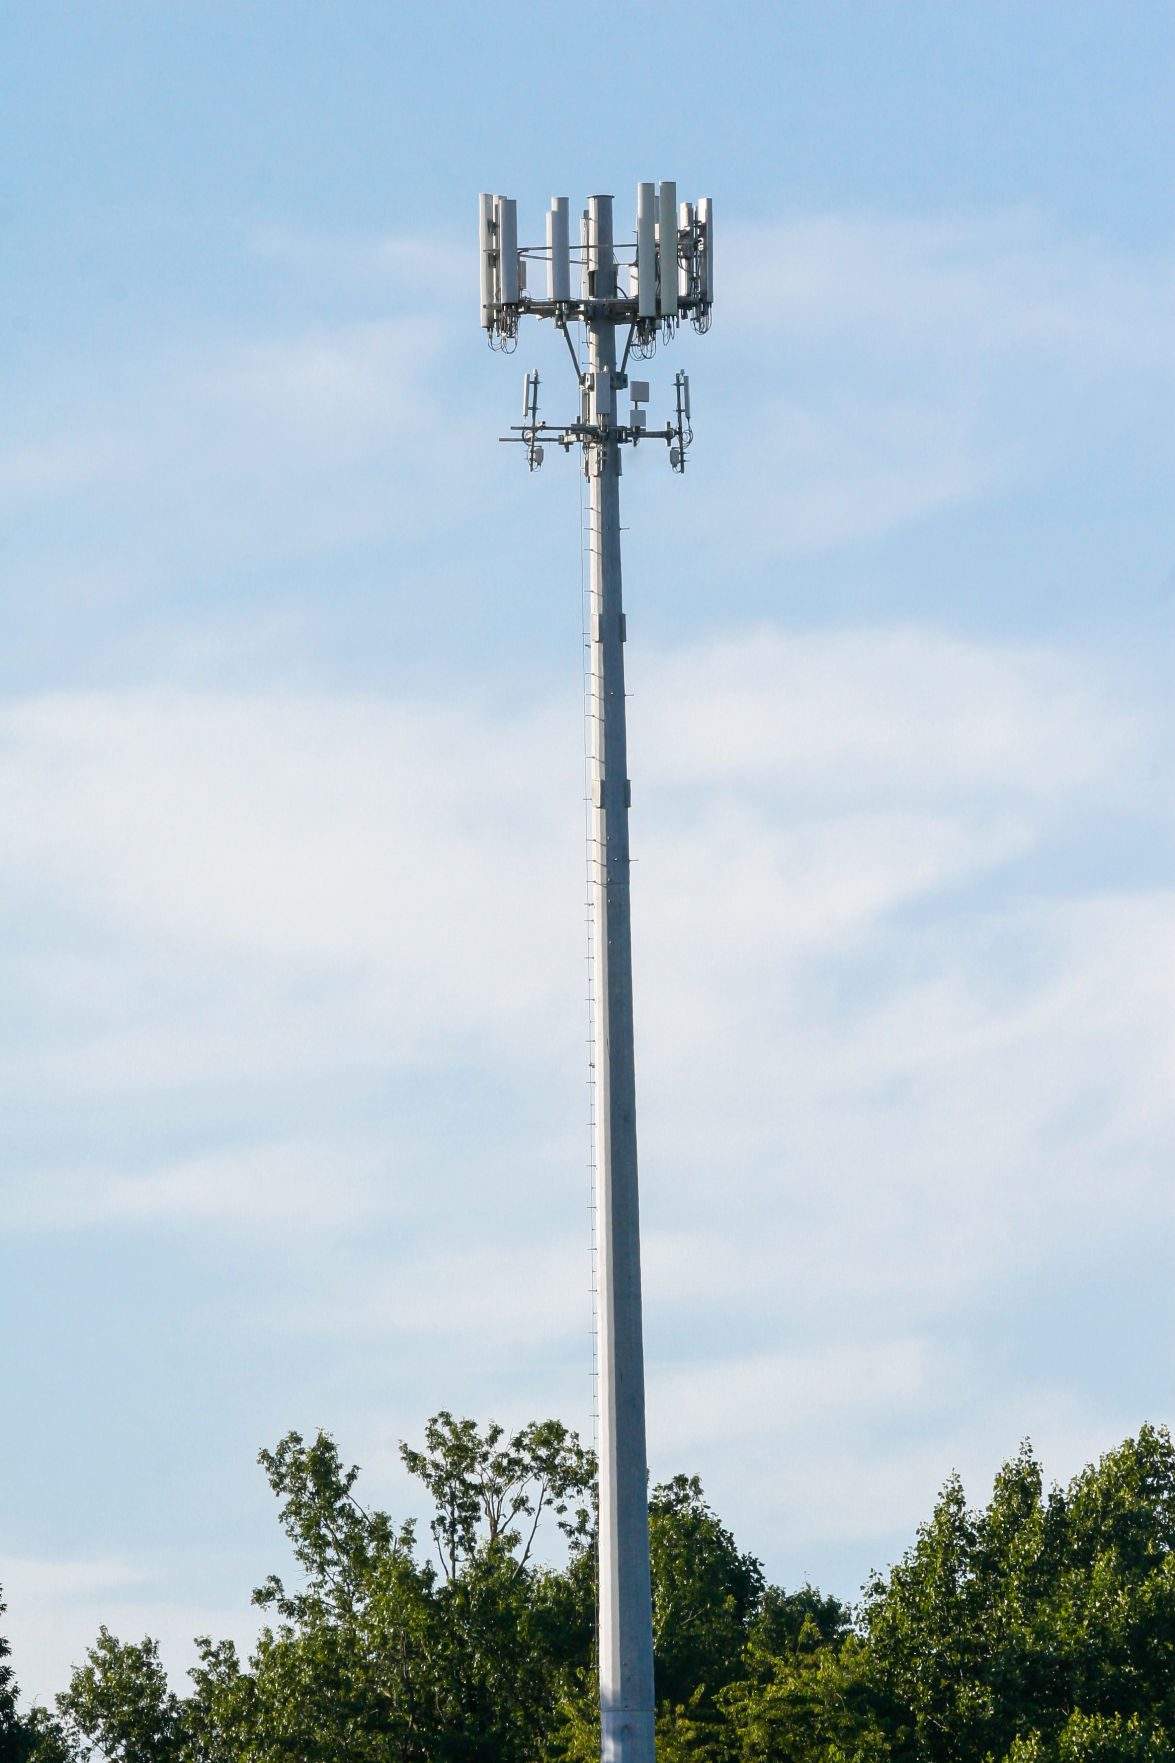 photo_ft_news_casanova tower 1.jpg